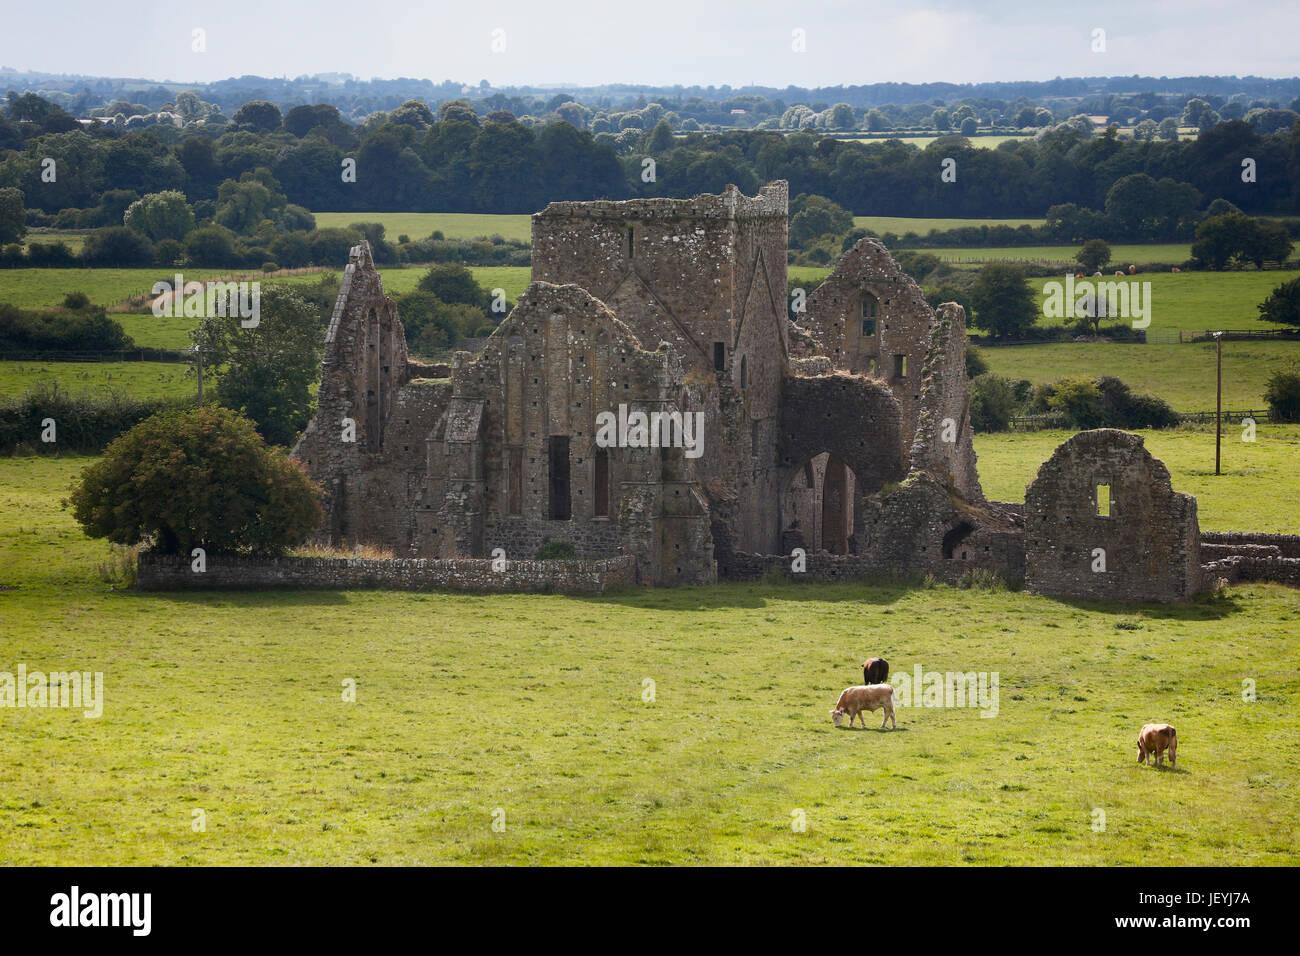 Cashel, County Tipperary, Republic of Ireland.  Ruins of the Cistercian Hore Abbey aka Hoare Abbey or St.Mary's. - Stock Image